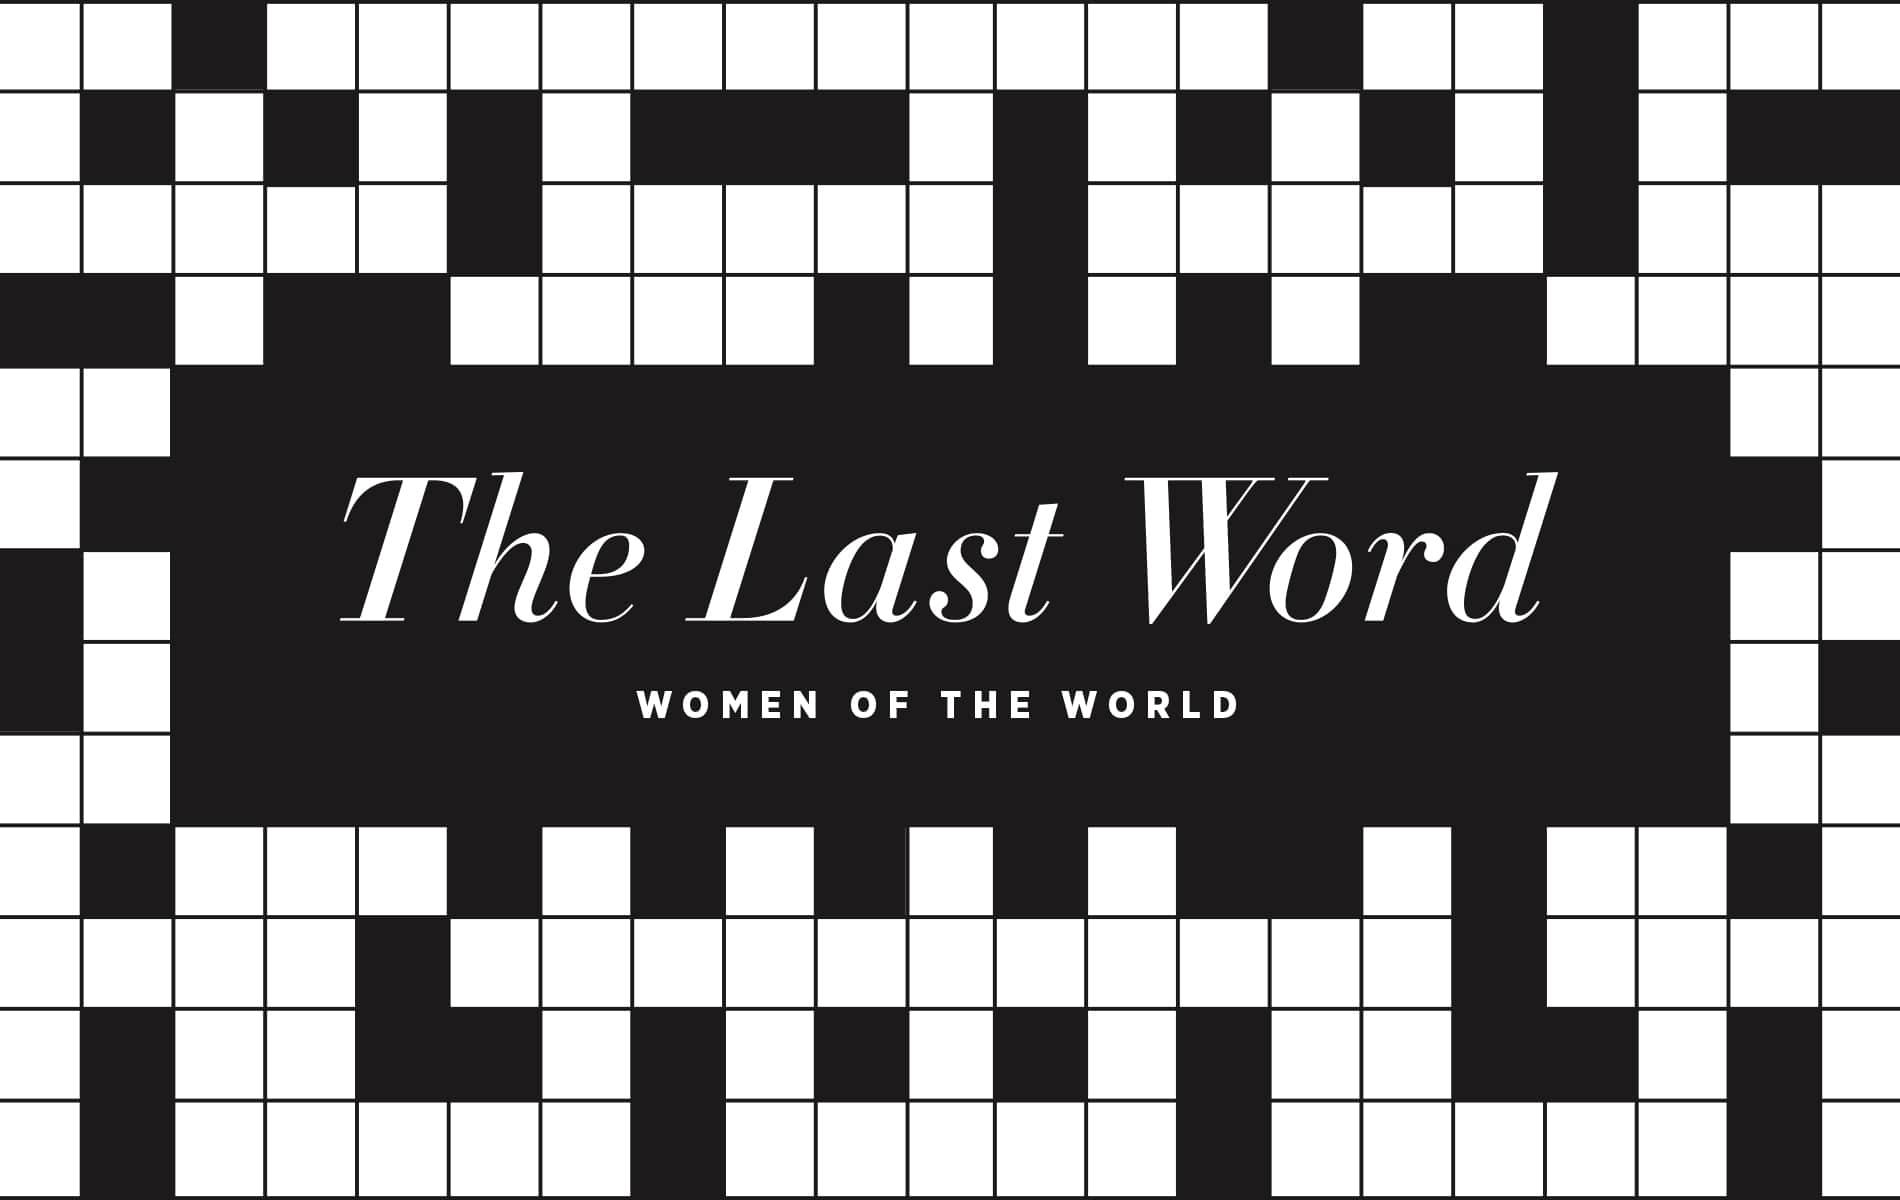 VIE Magazine December 2019 The Women's Issue Crossword Puzzle Women of the World